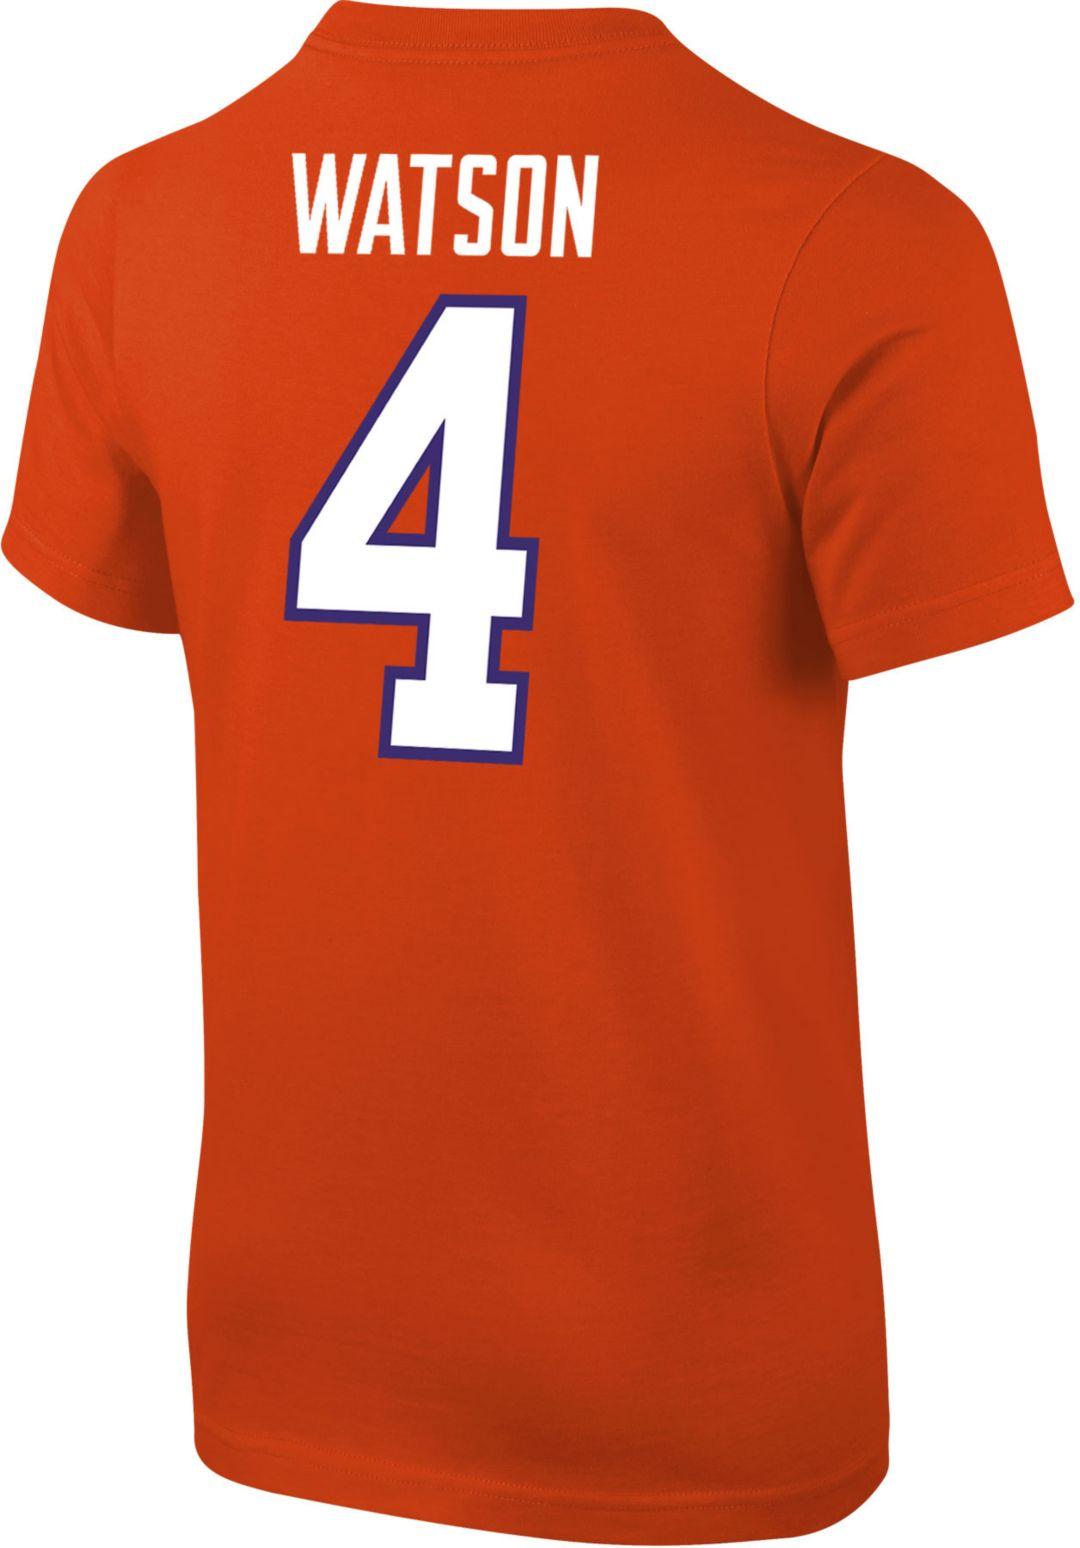 premium selection 156c5 dbd6f Nike Youth Deshaun Watson Clemson Tigers #4 Orange Cotton Football Jersey  T-Shirt